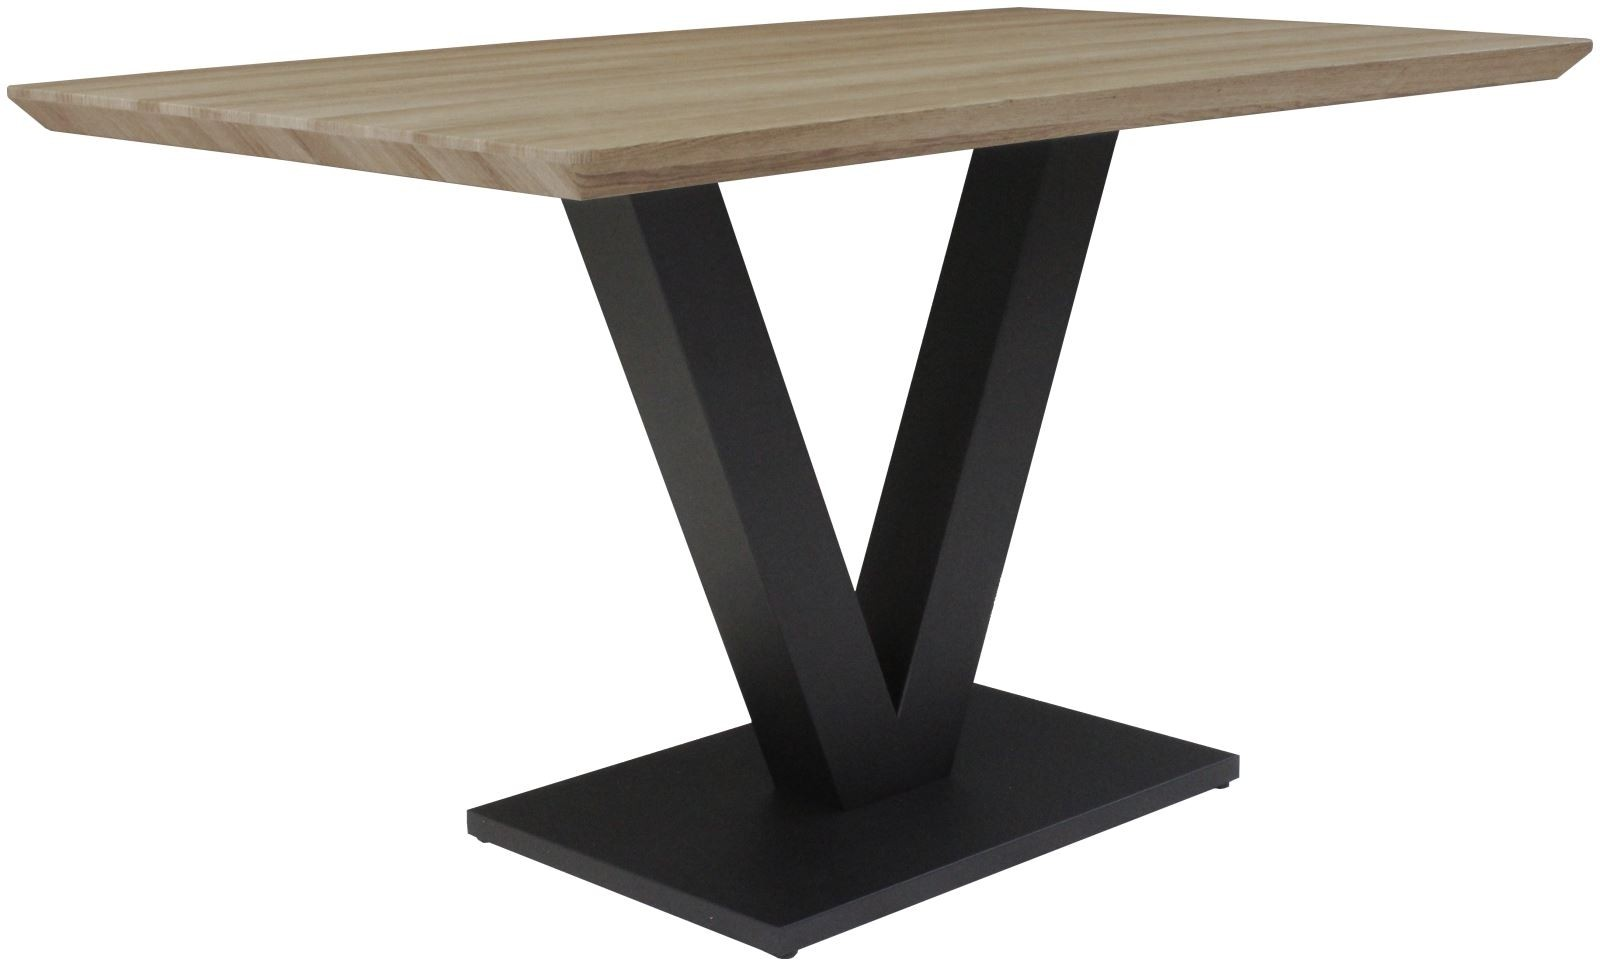 LARSON Dining Table - Delta Light Oak Finish